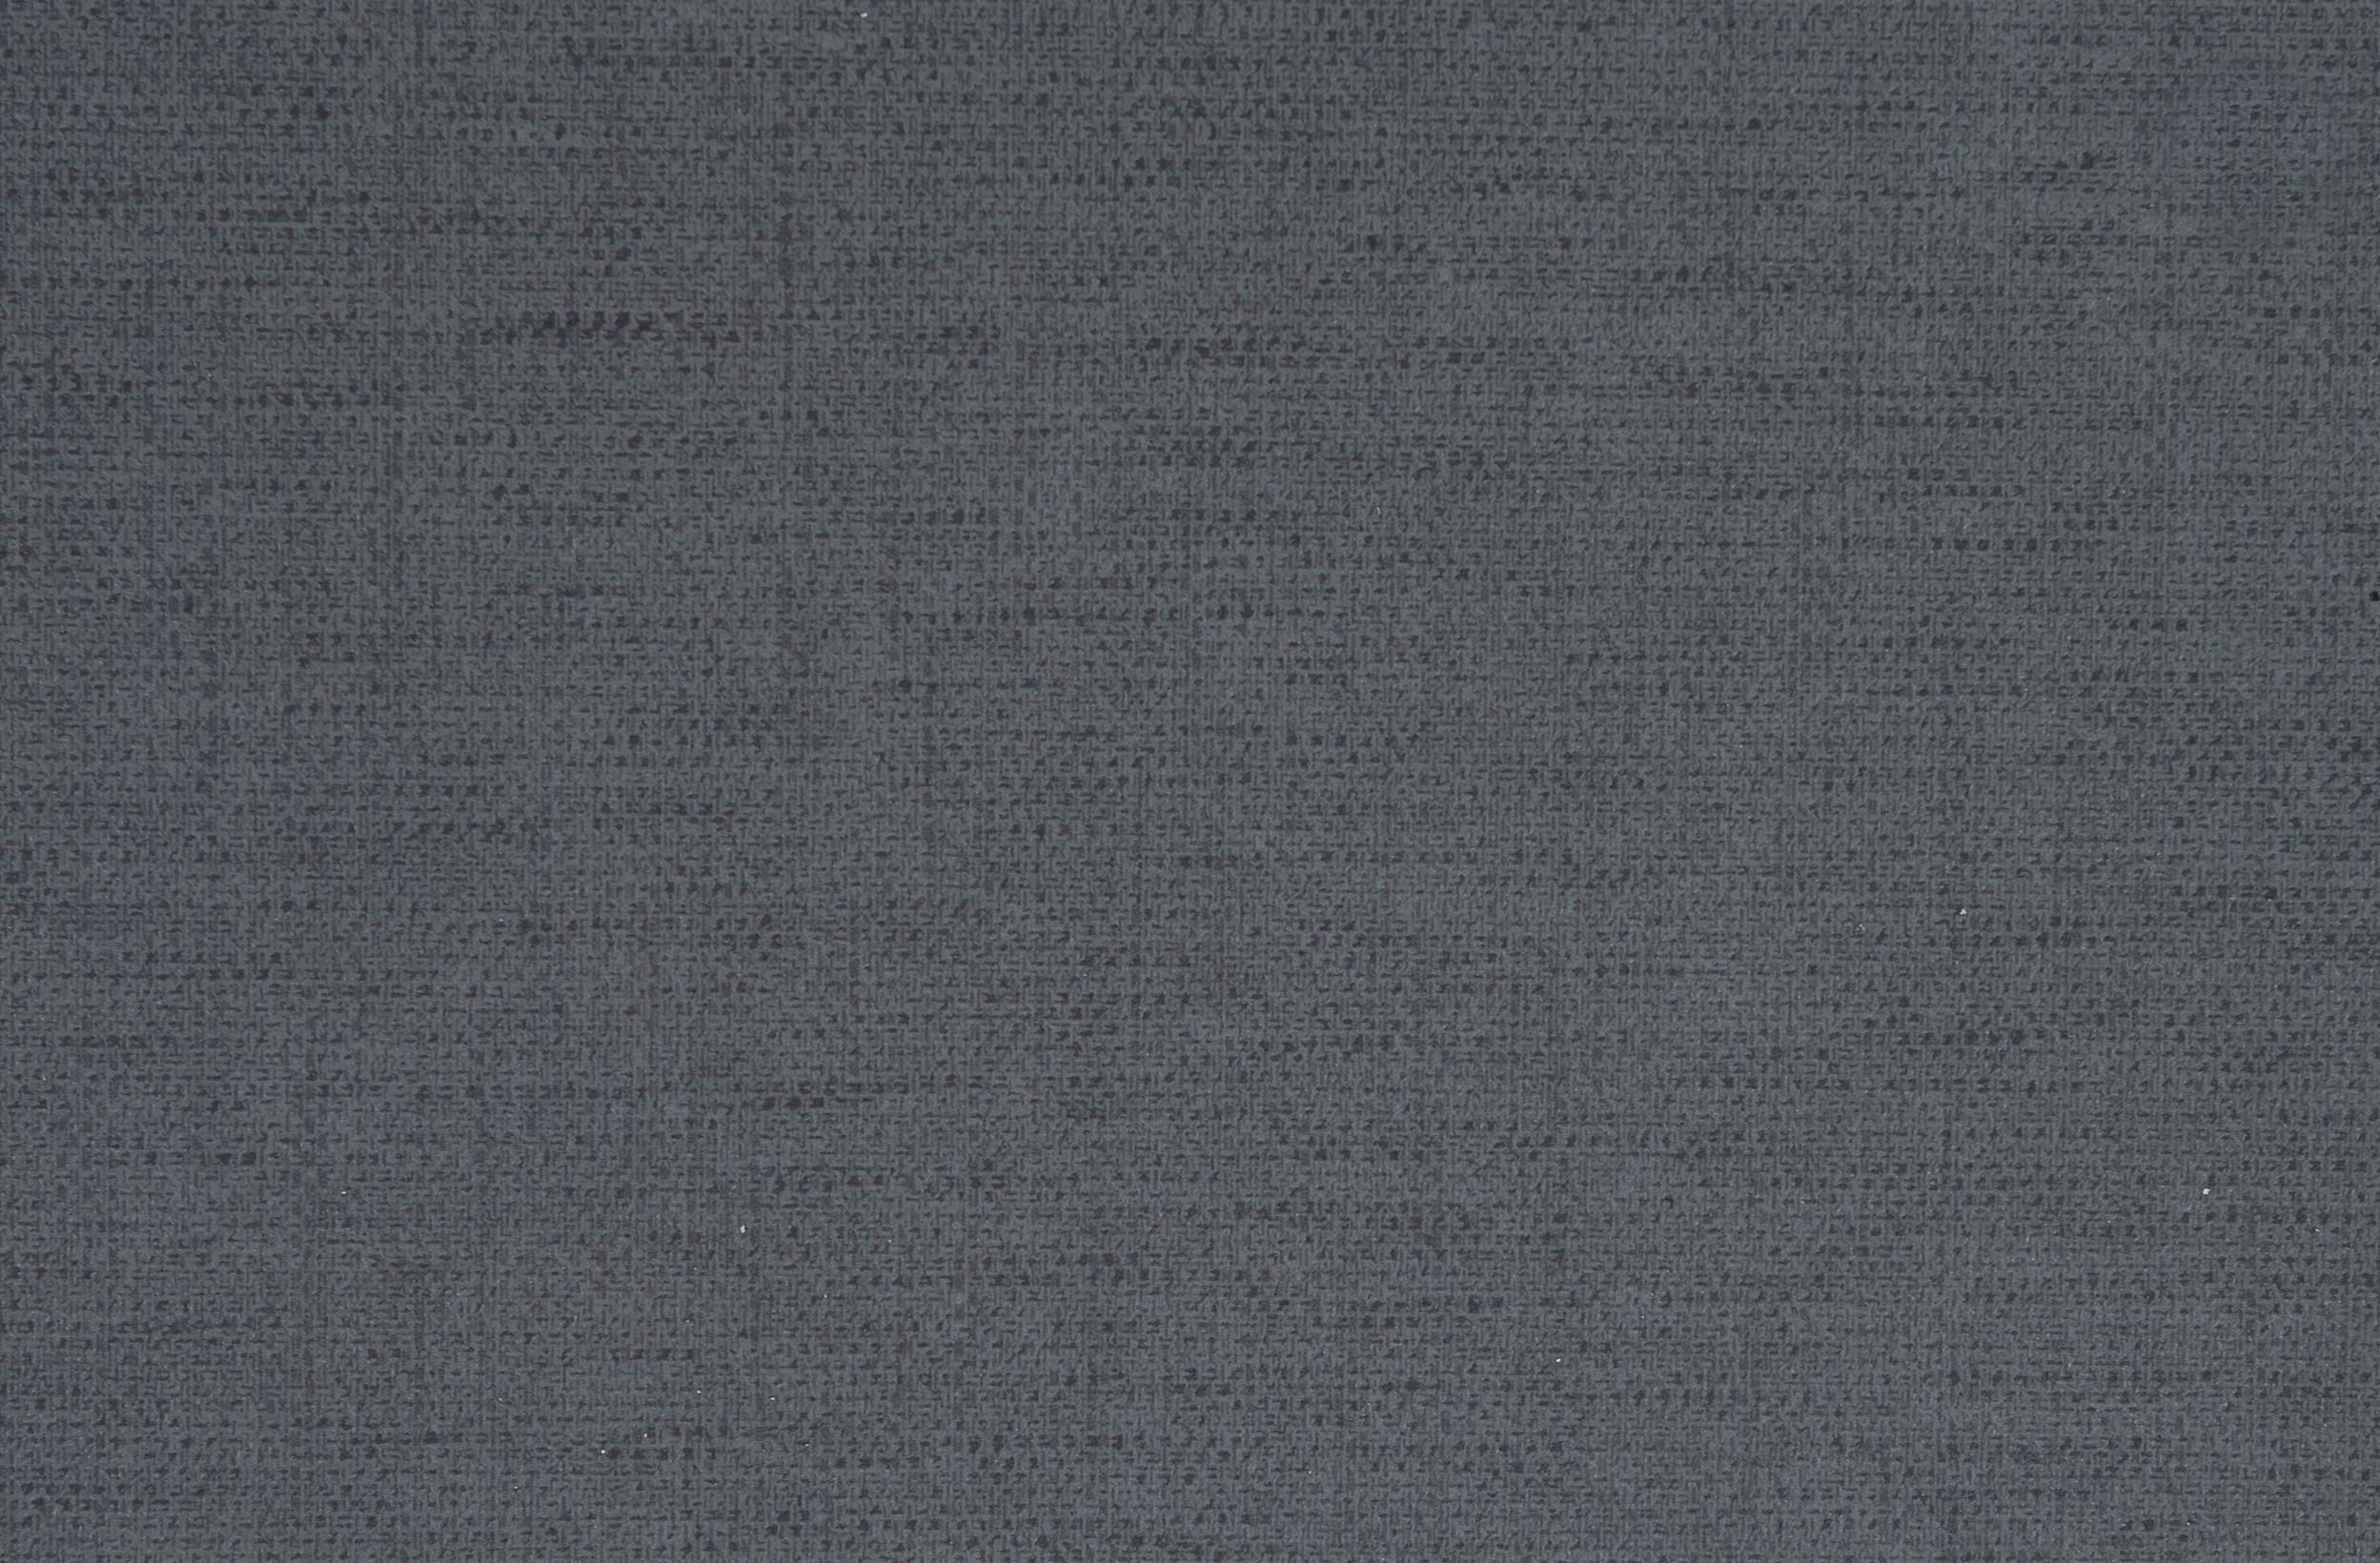 PVC podlaha Xtreme Sia 999D - Rozměr na míru cm